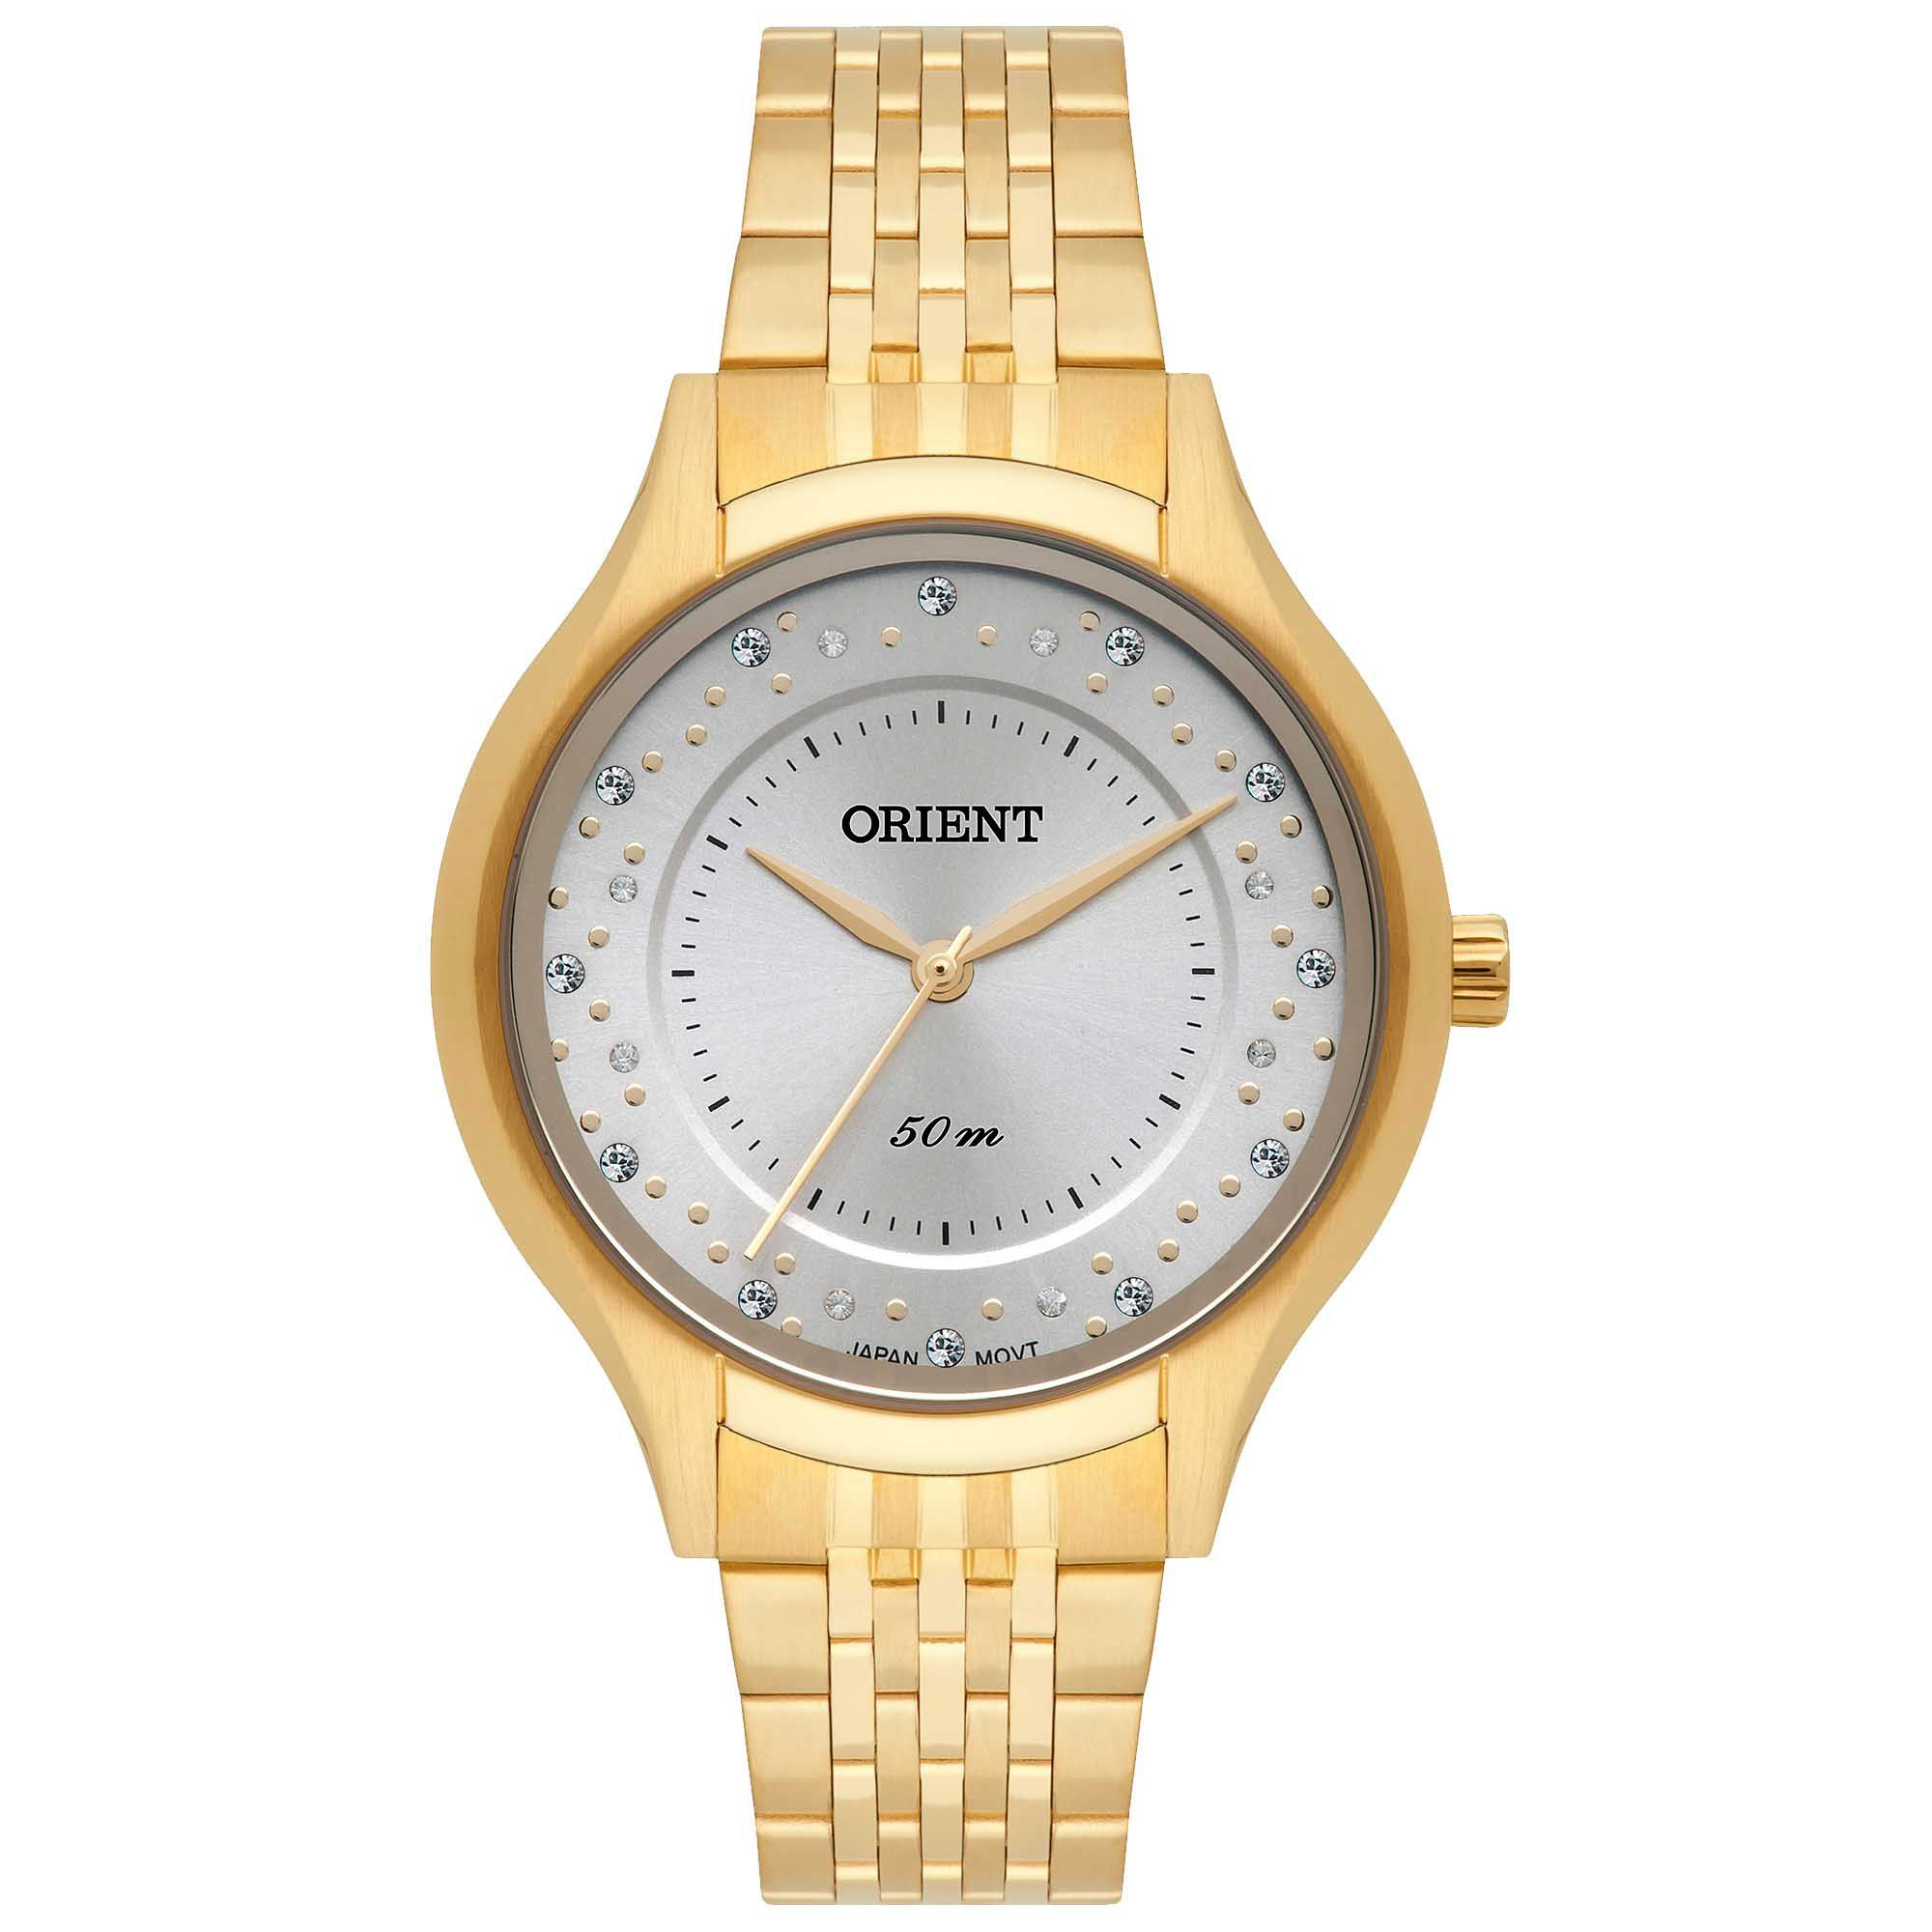 Relógio Feminino Orient FGSS0114 G1KX